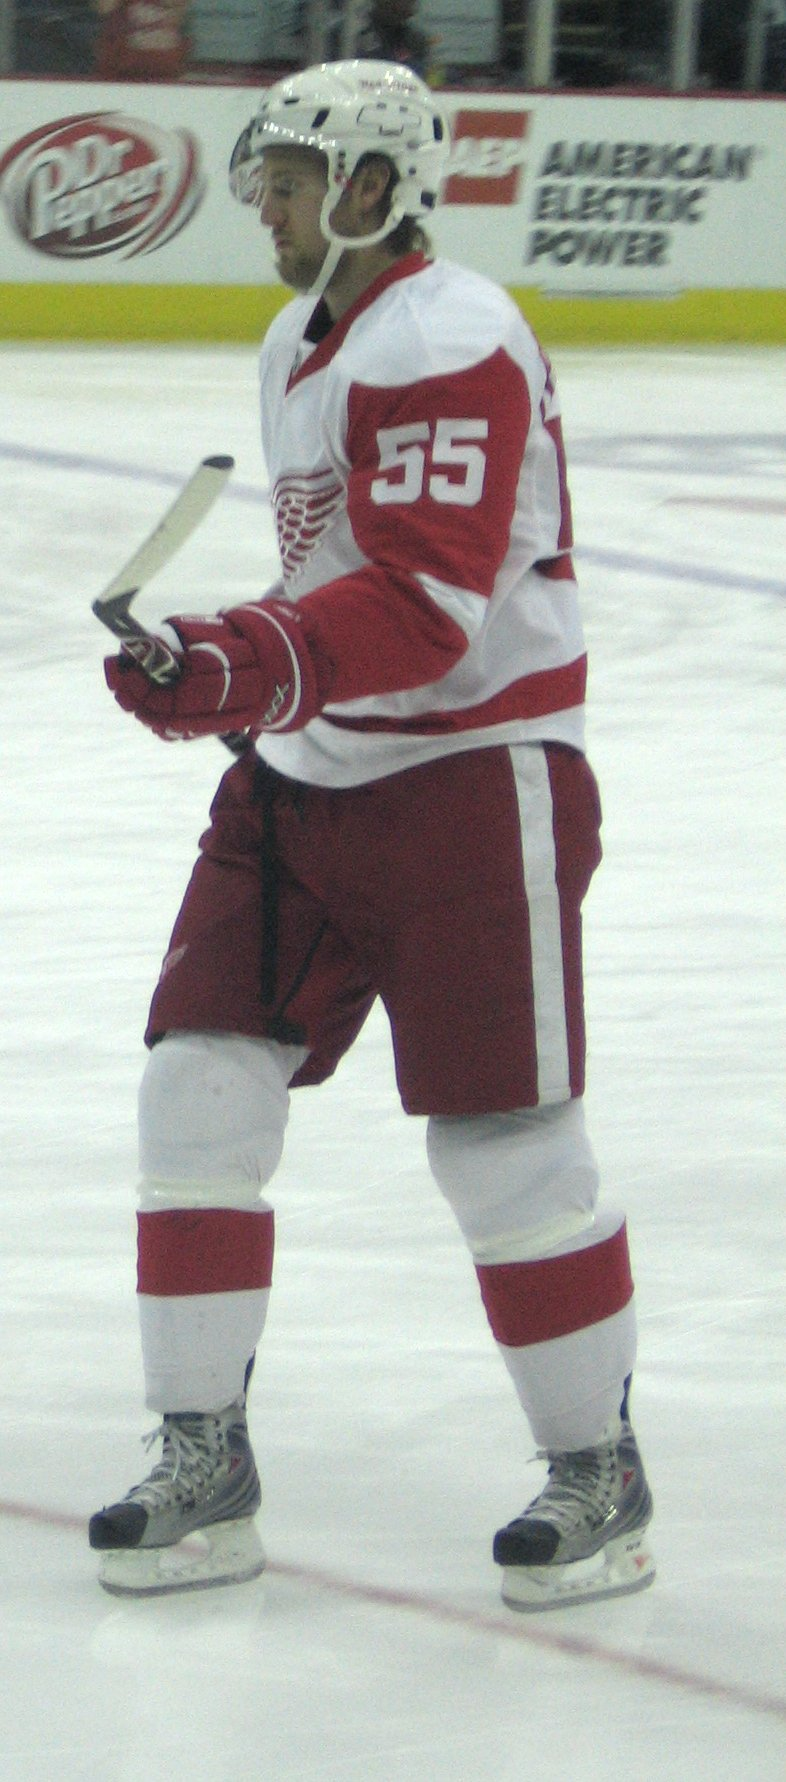 2006 IIHF World Championship Rosters